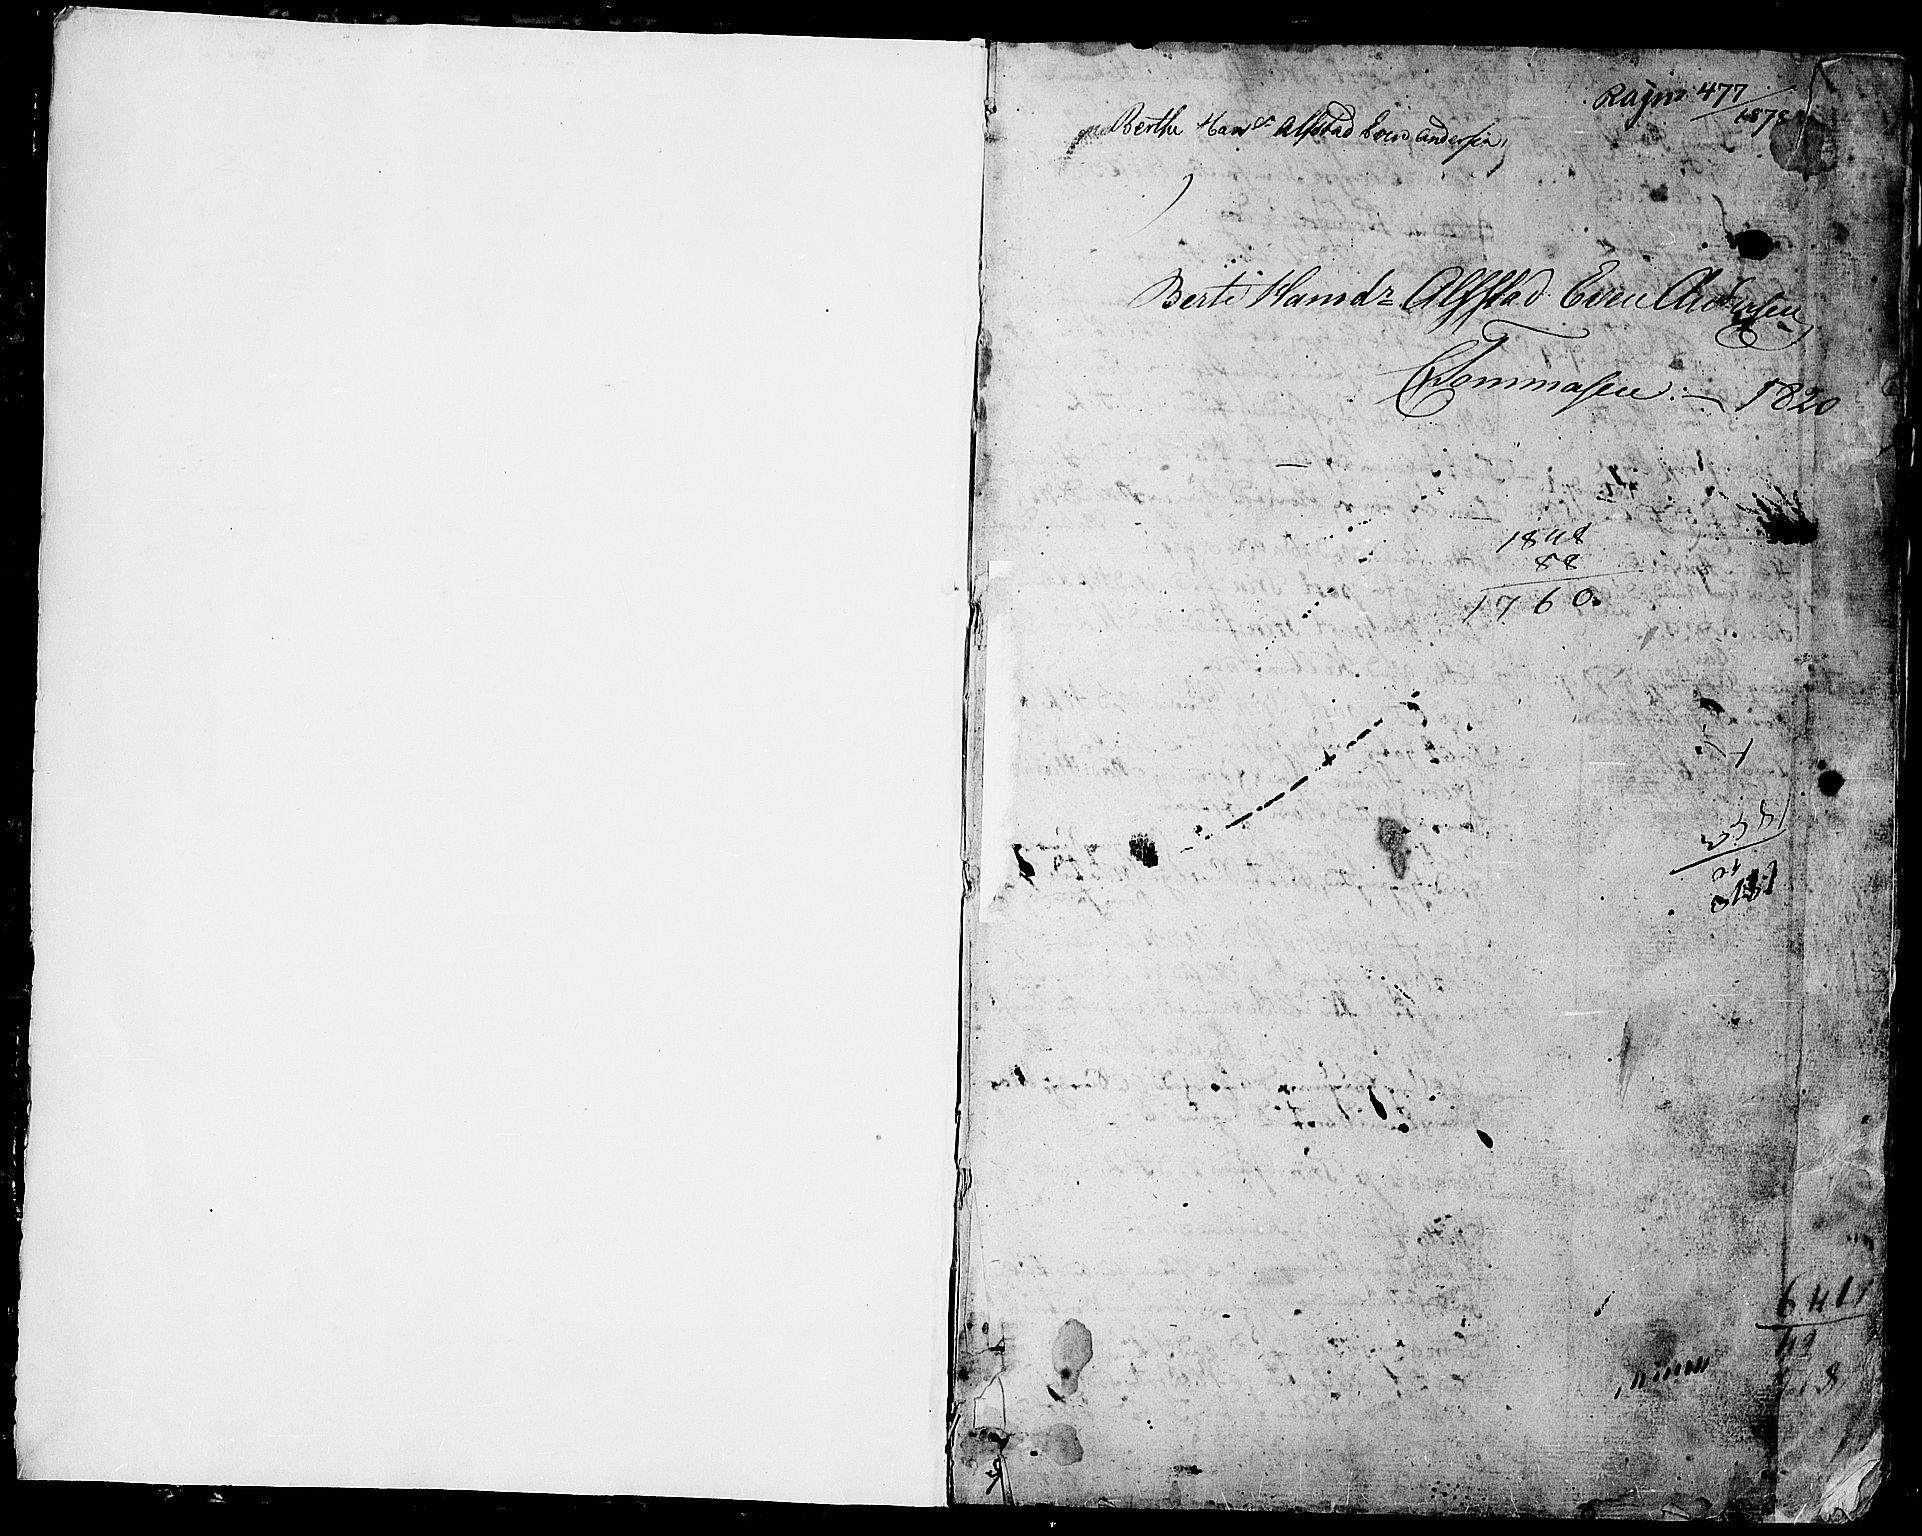 SAH, Toten prestekontor, Ministerialbok nr. 4, 1751-1761